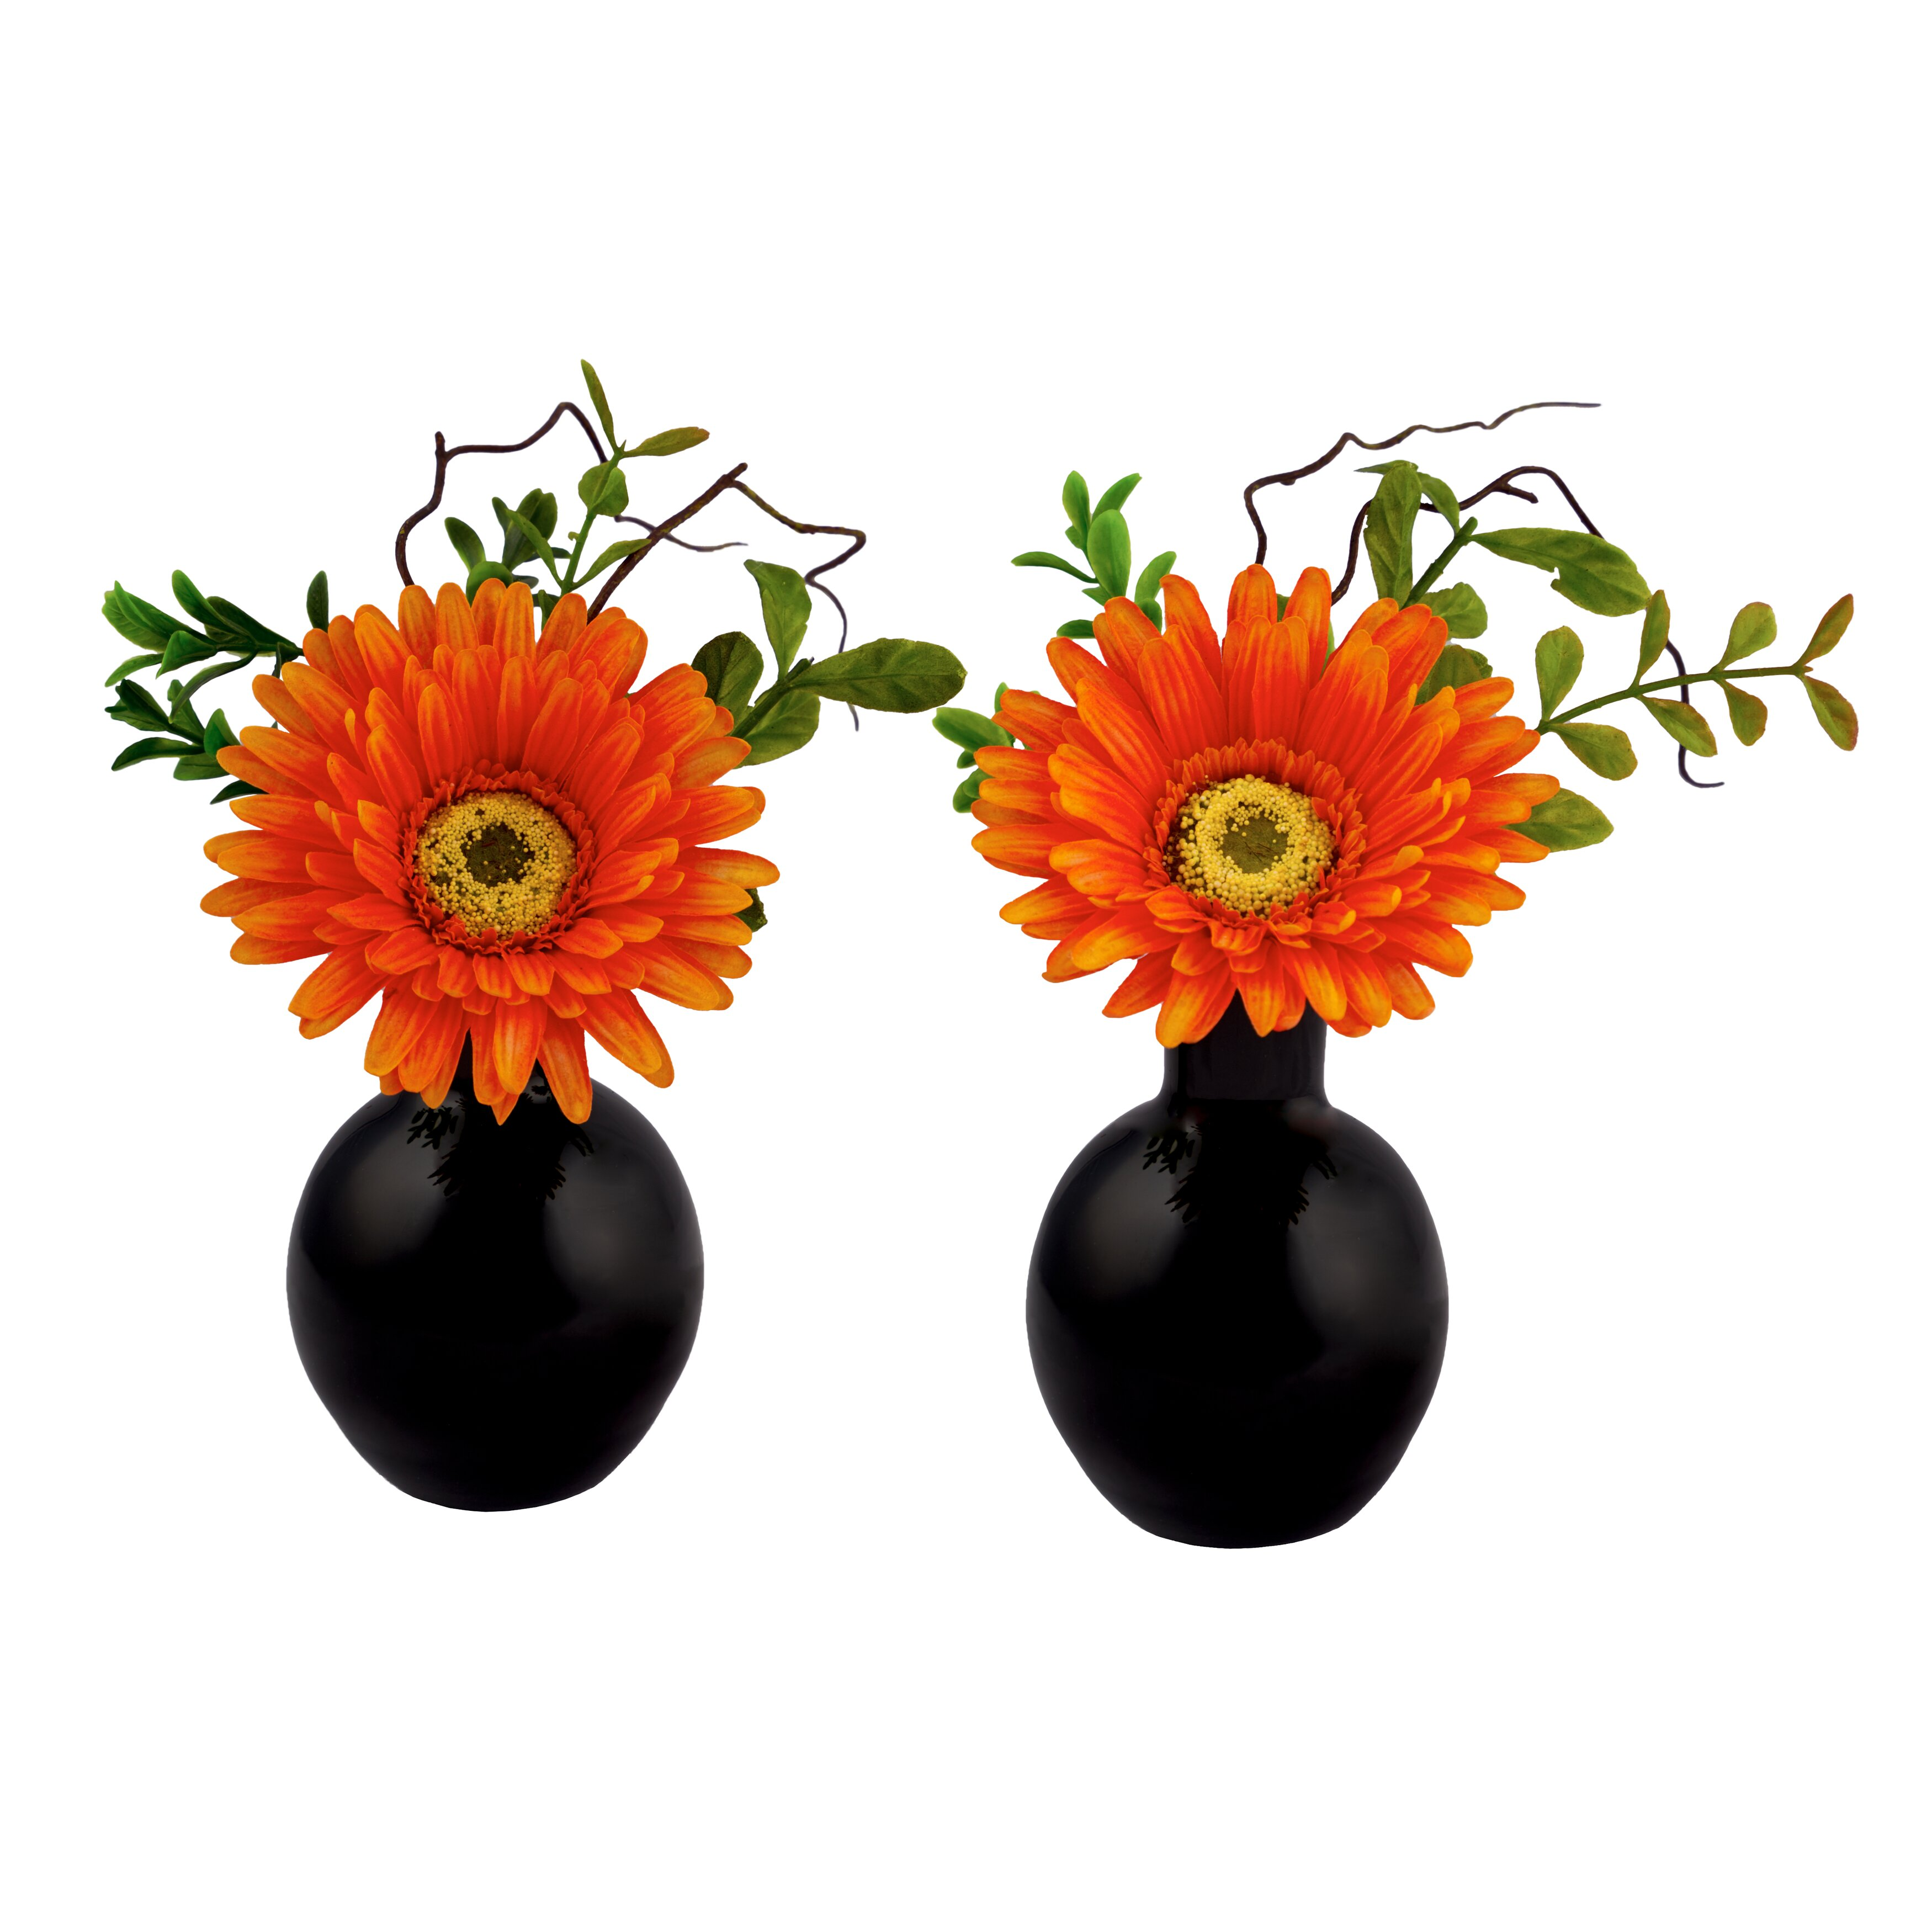 Gerbera Daisy Arrangements Vases: Red Vanilla Gerbera Daisy Arrangement In Glass Vase